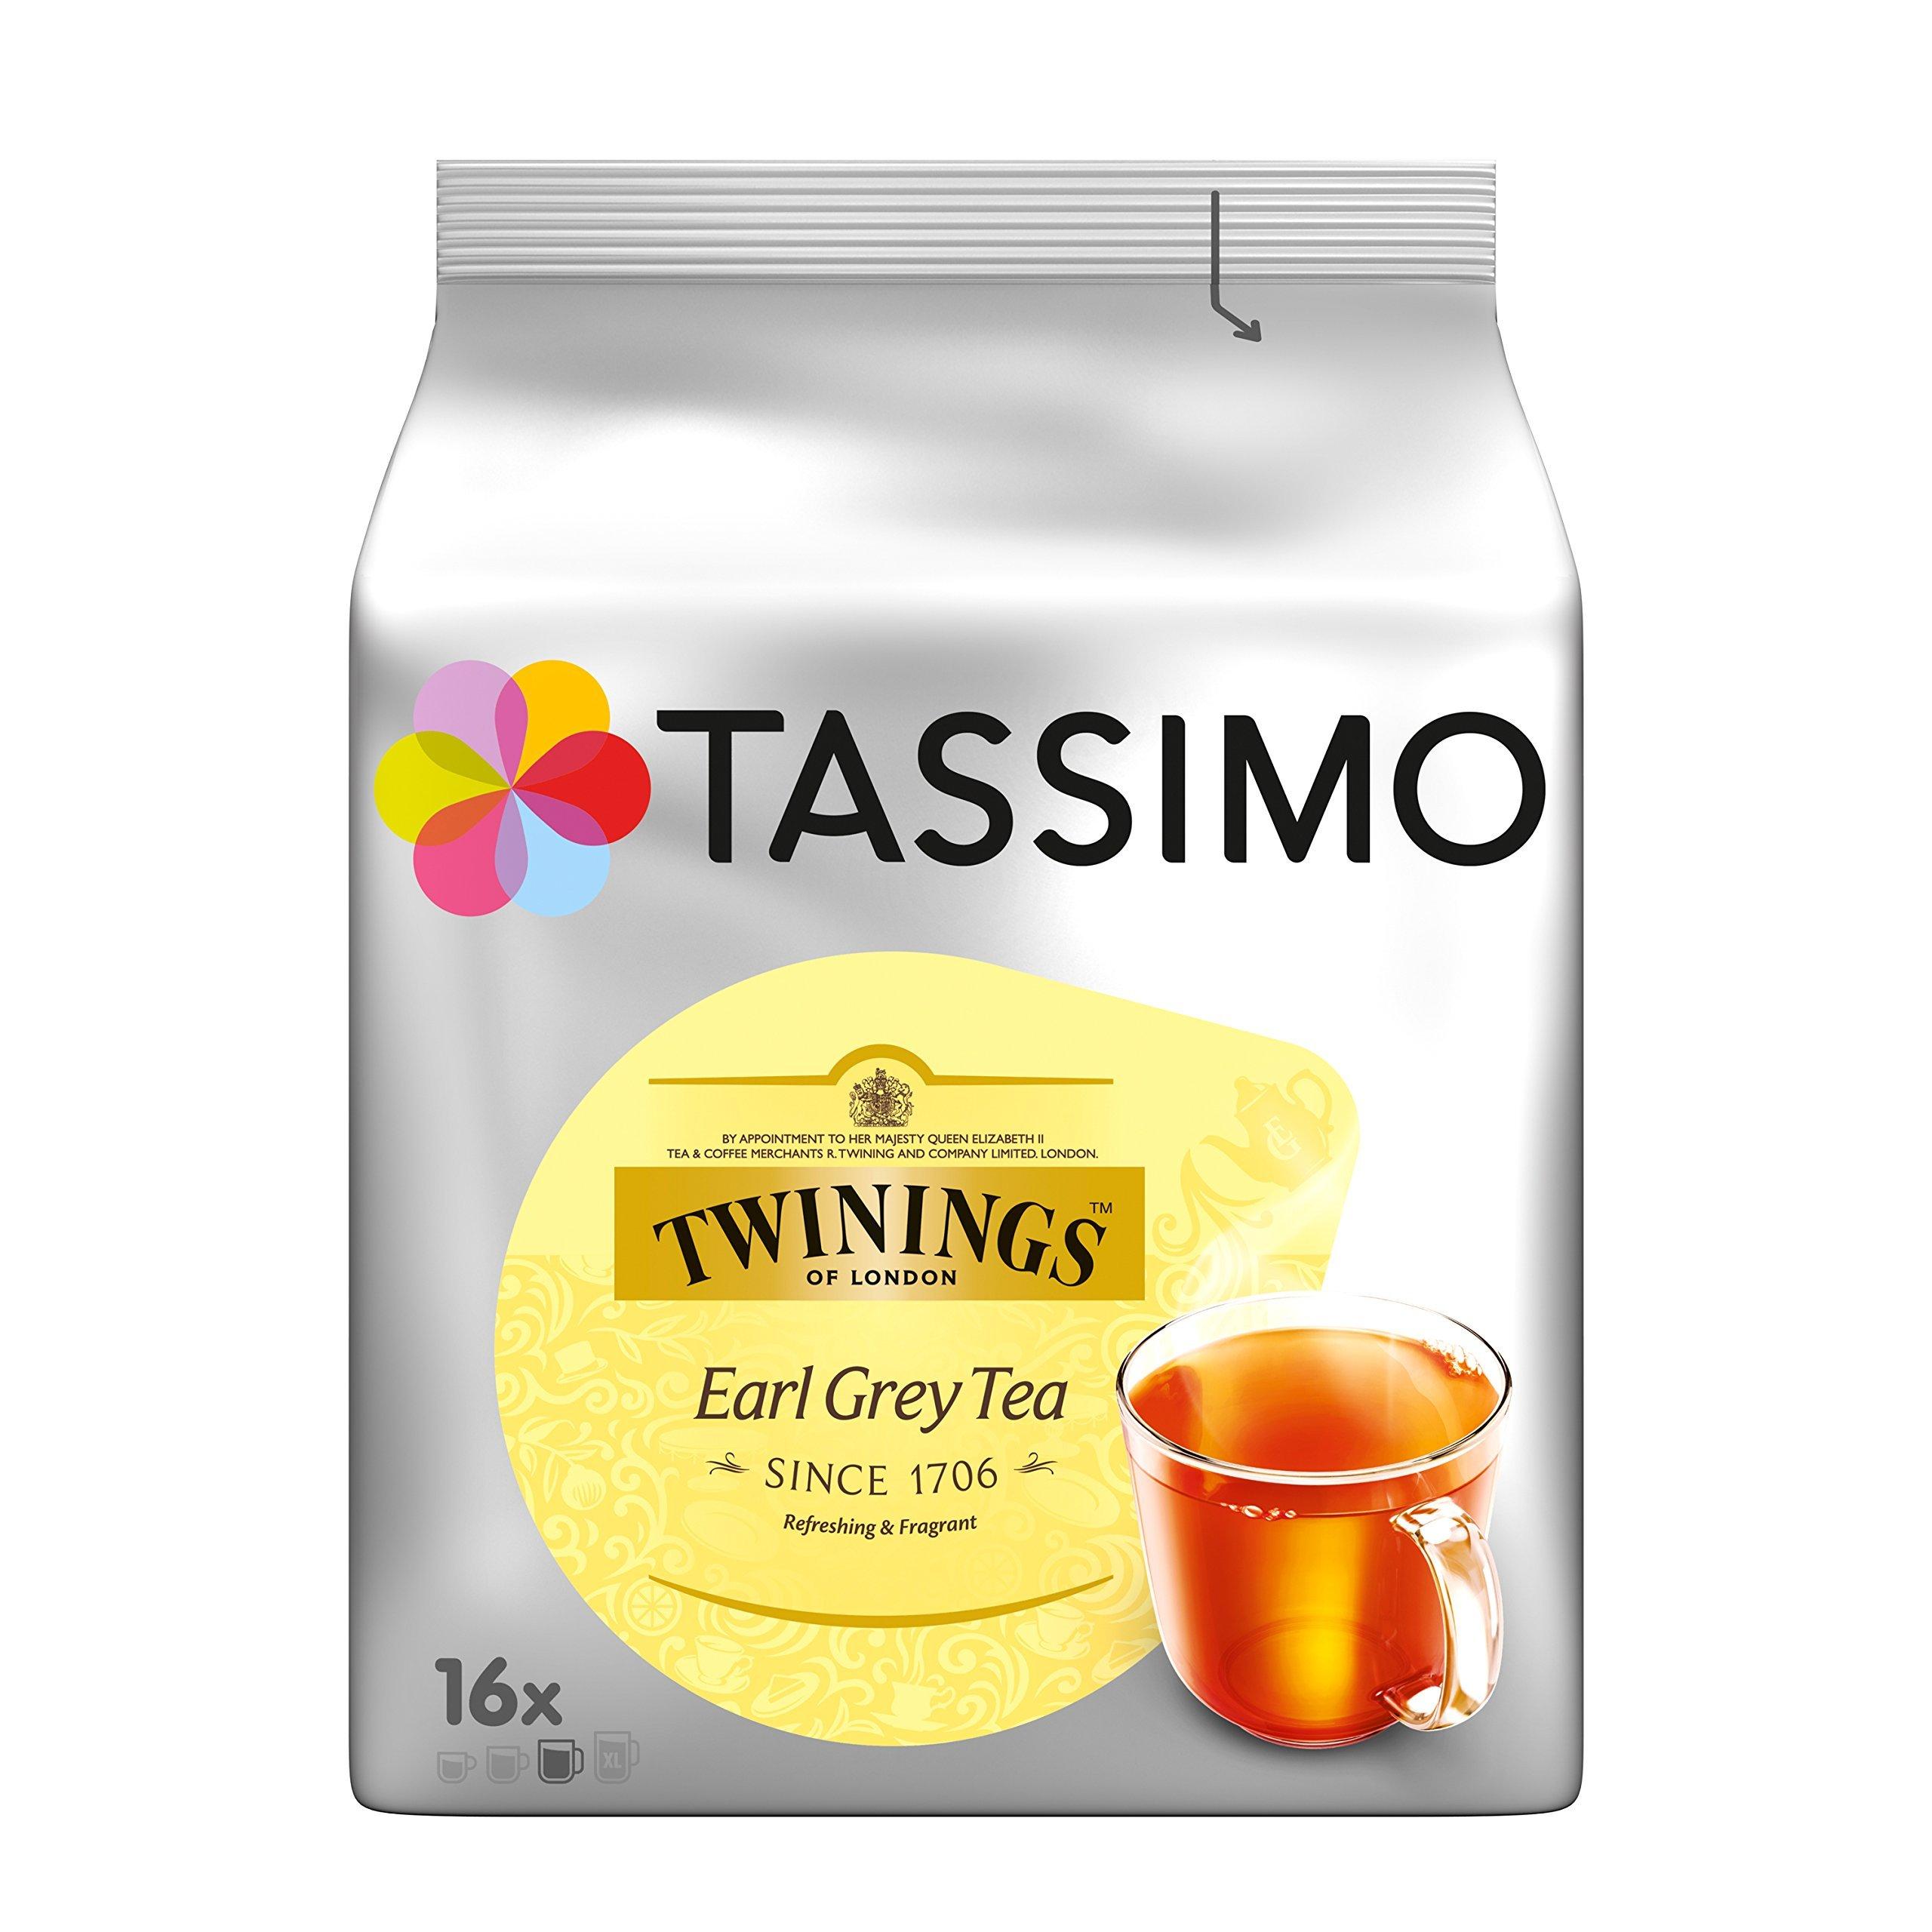 Tassimo-Twinings-Earl-Grey-Tee-5er-Pack-5-x-16-Portionen